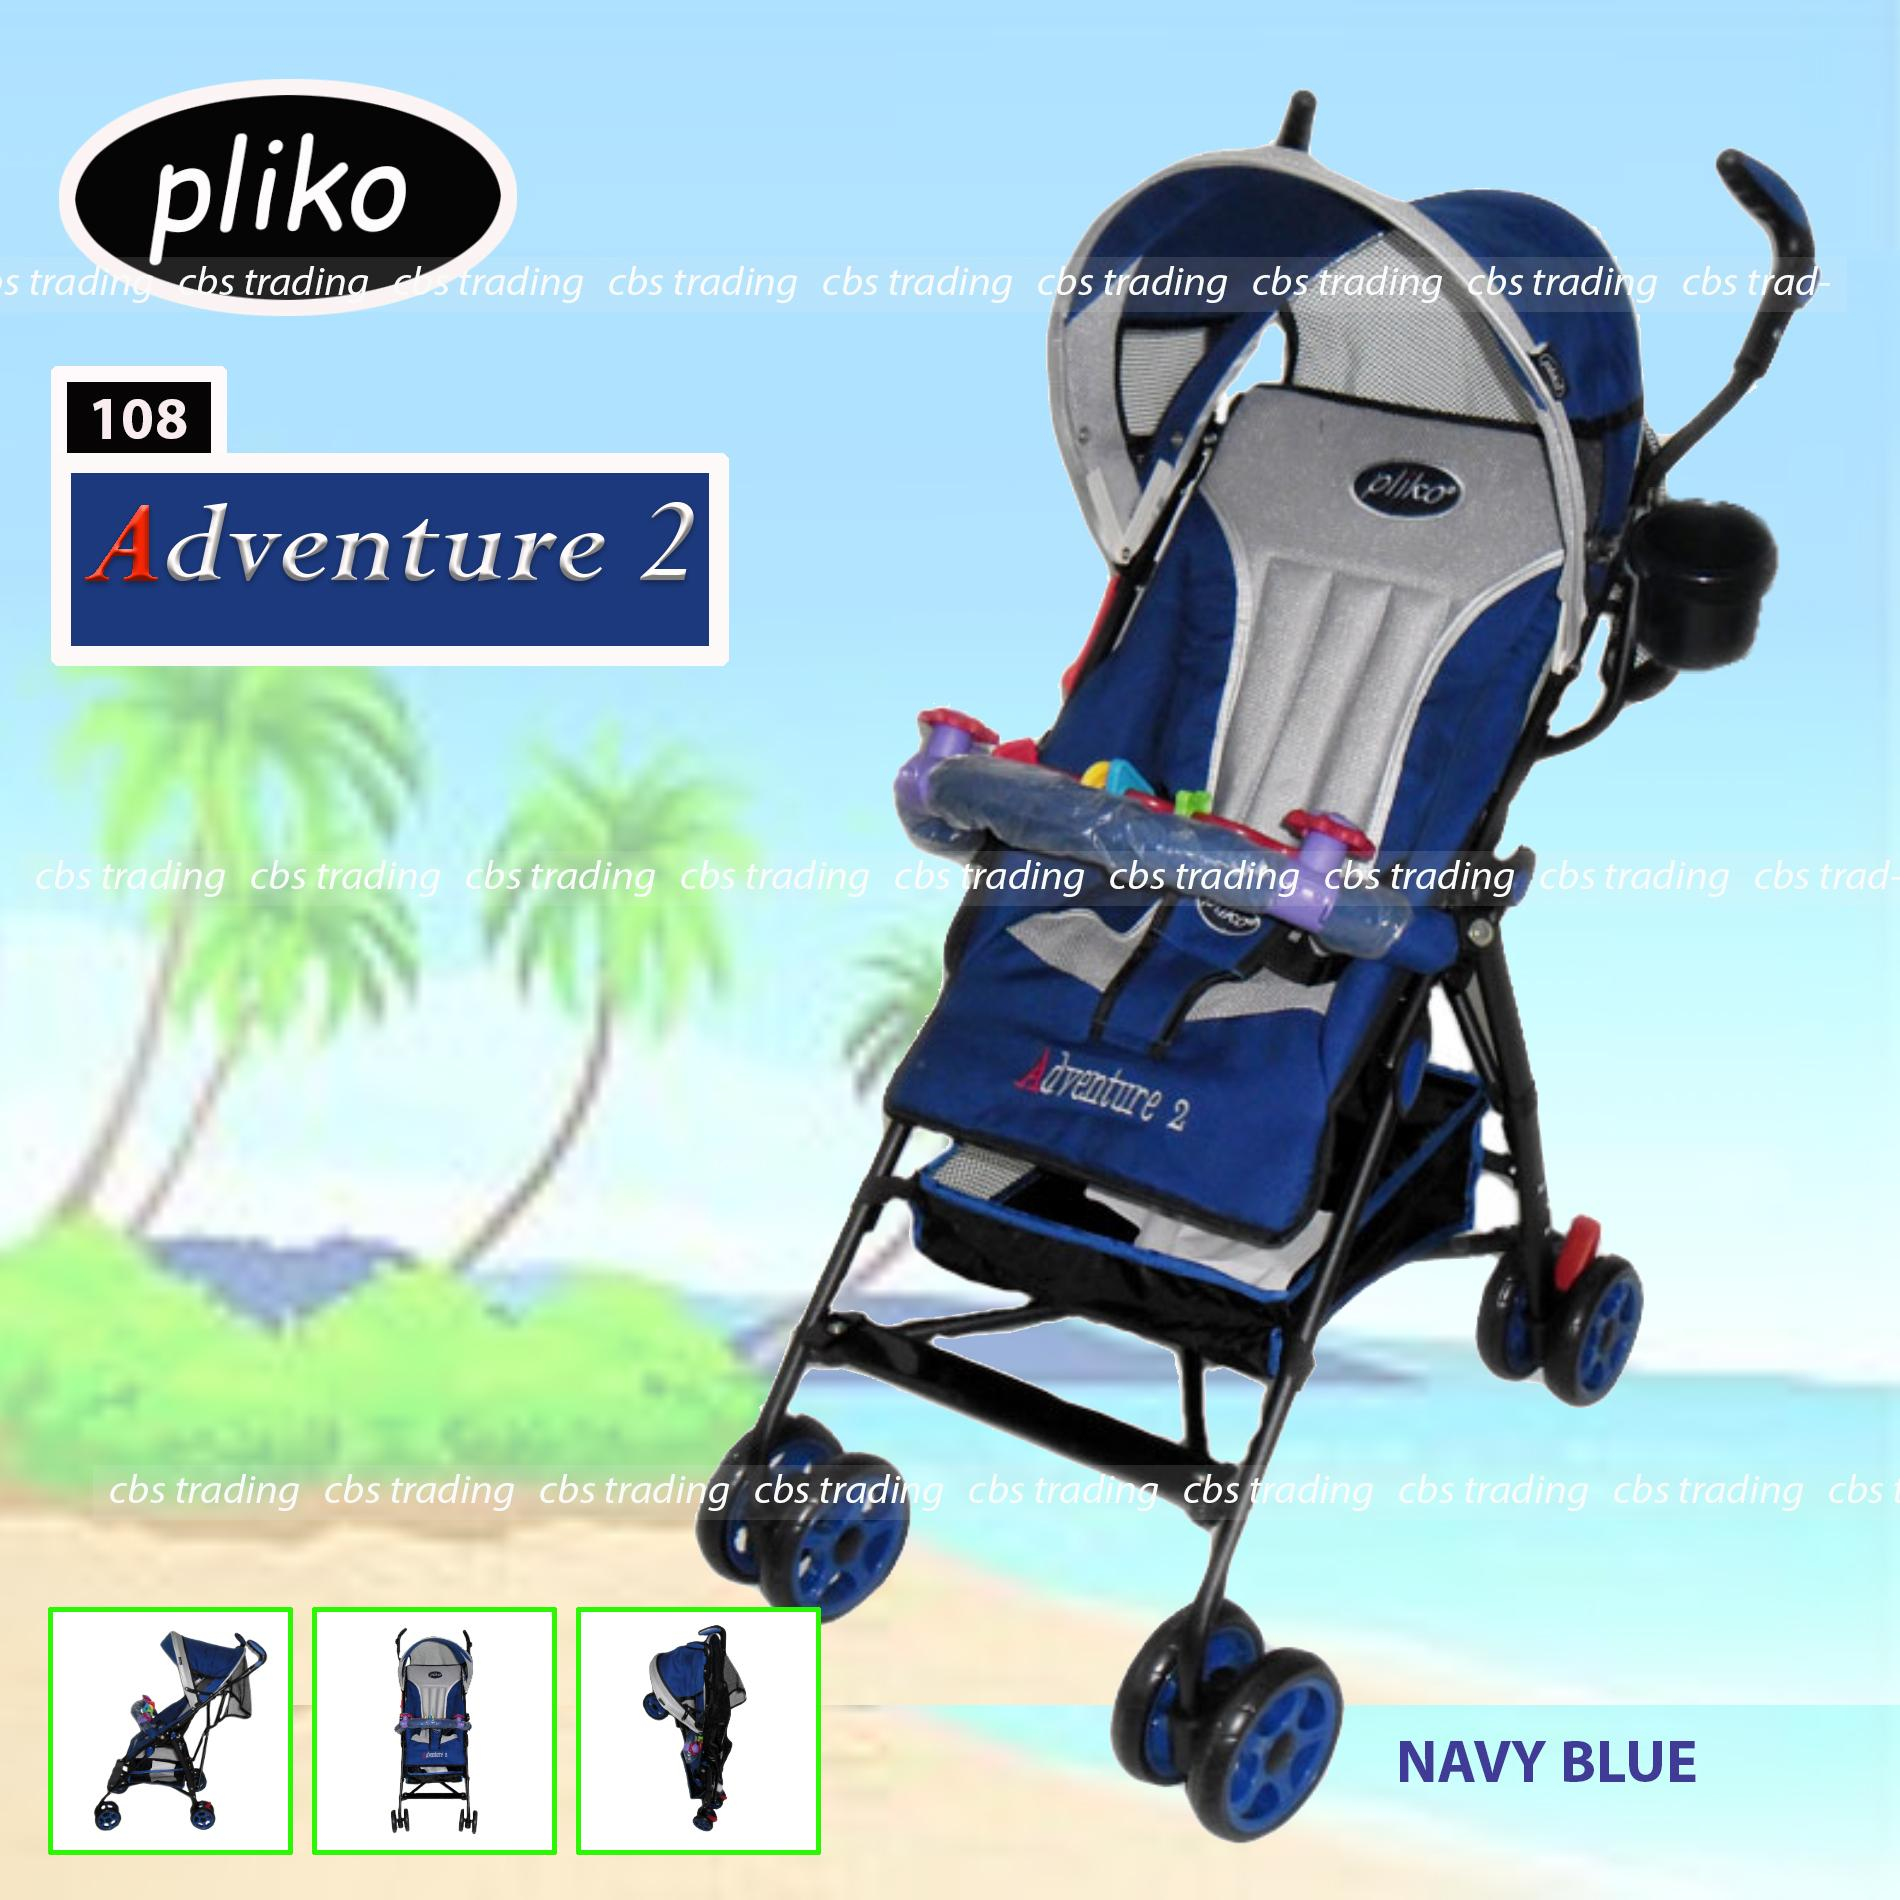 Pliko Stroller New Buggy Adventure 2 S-108 Kereta Dorong Bayi - Navy Blue